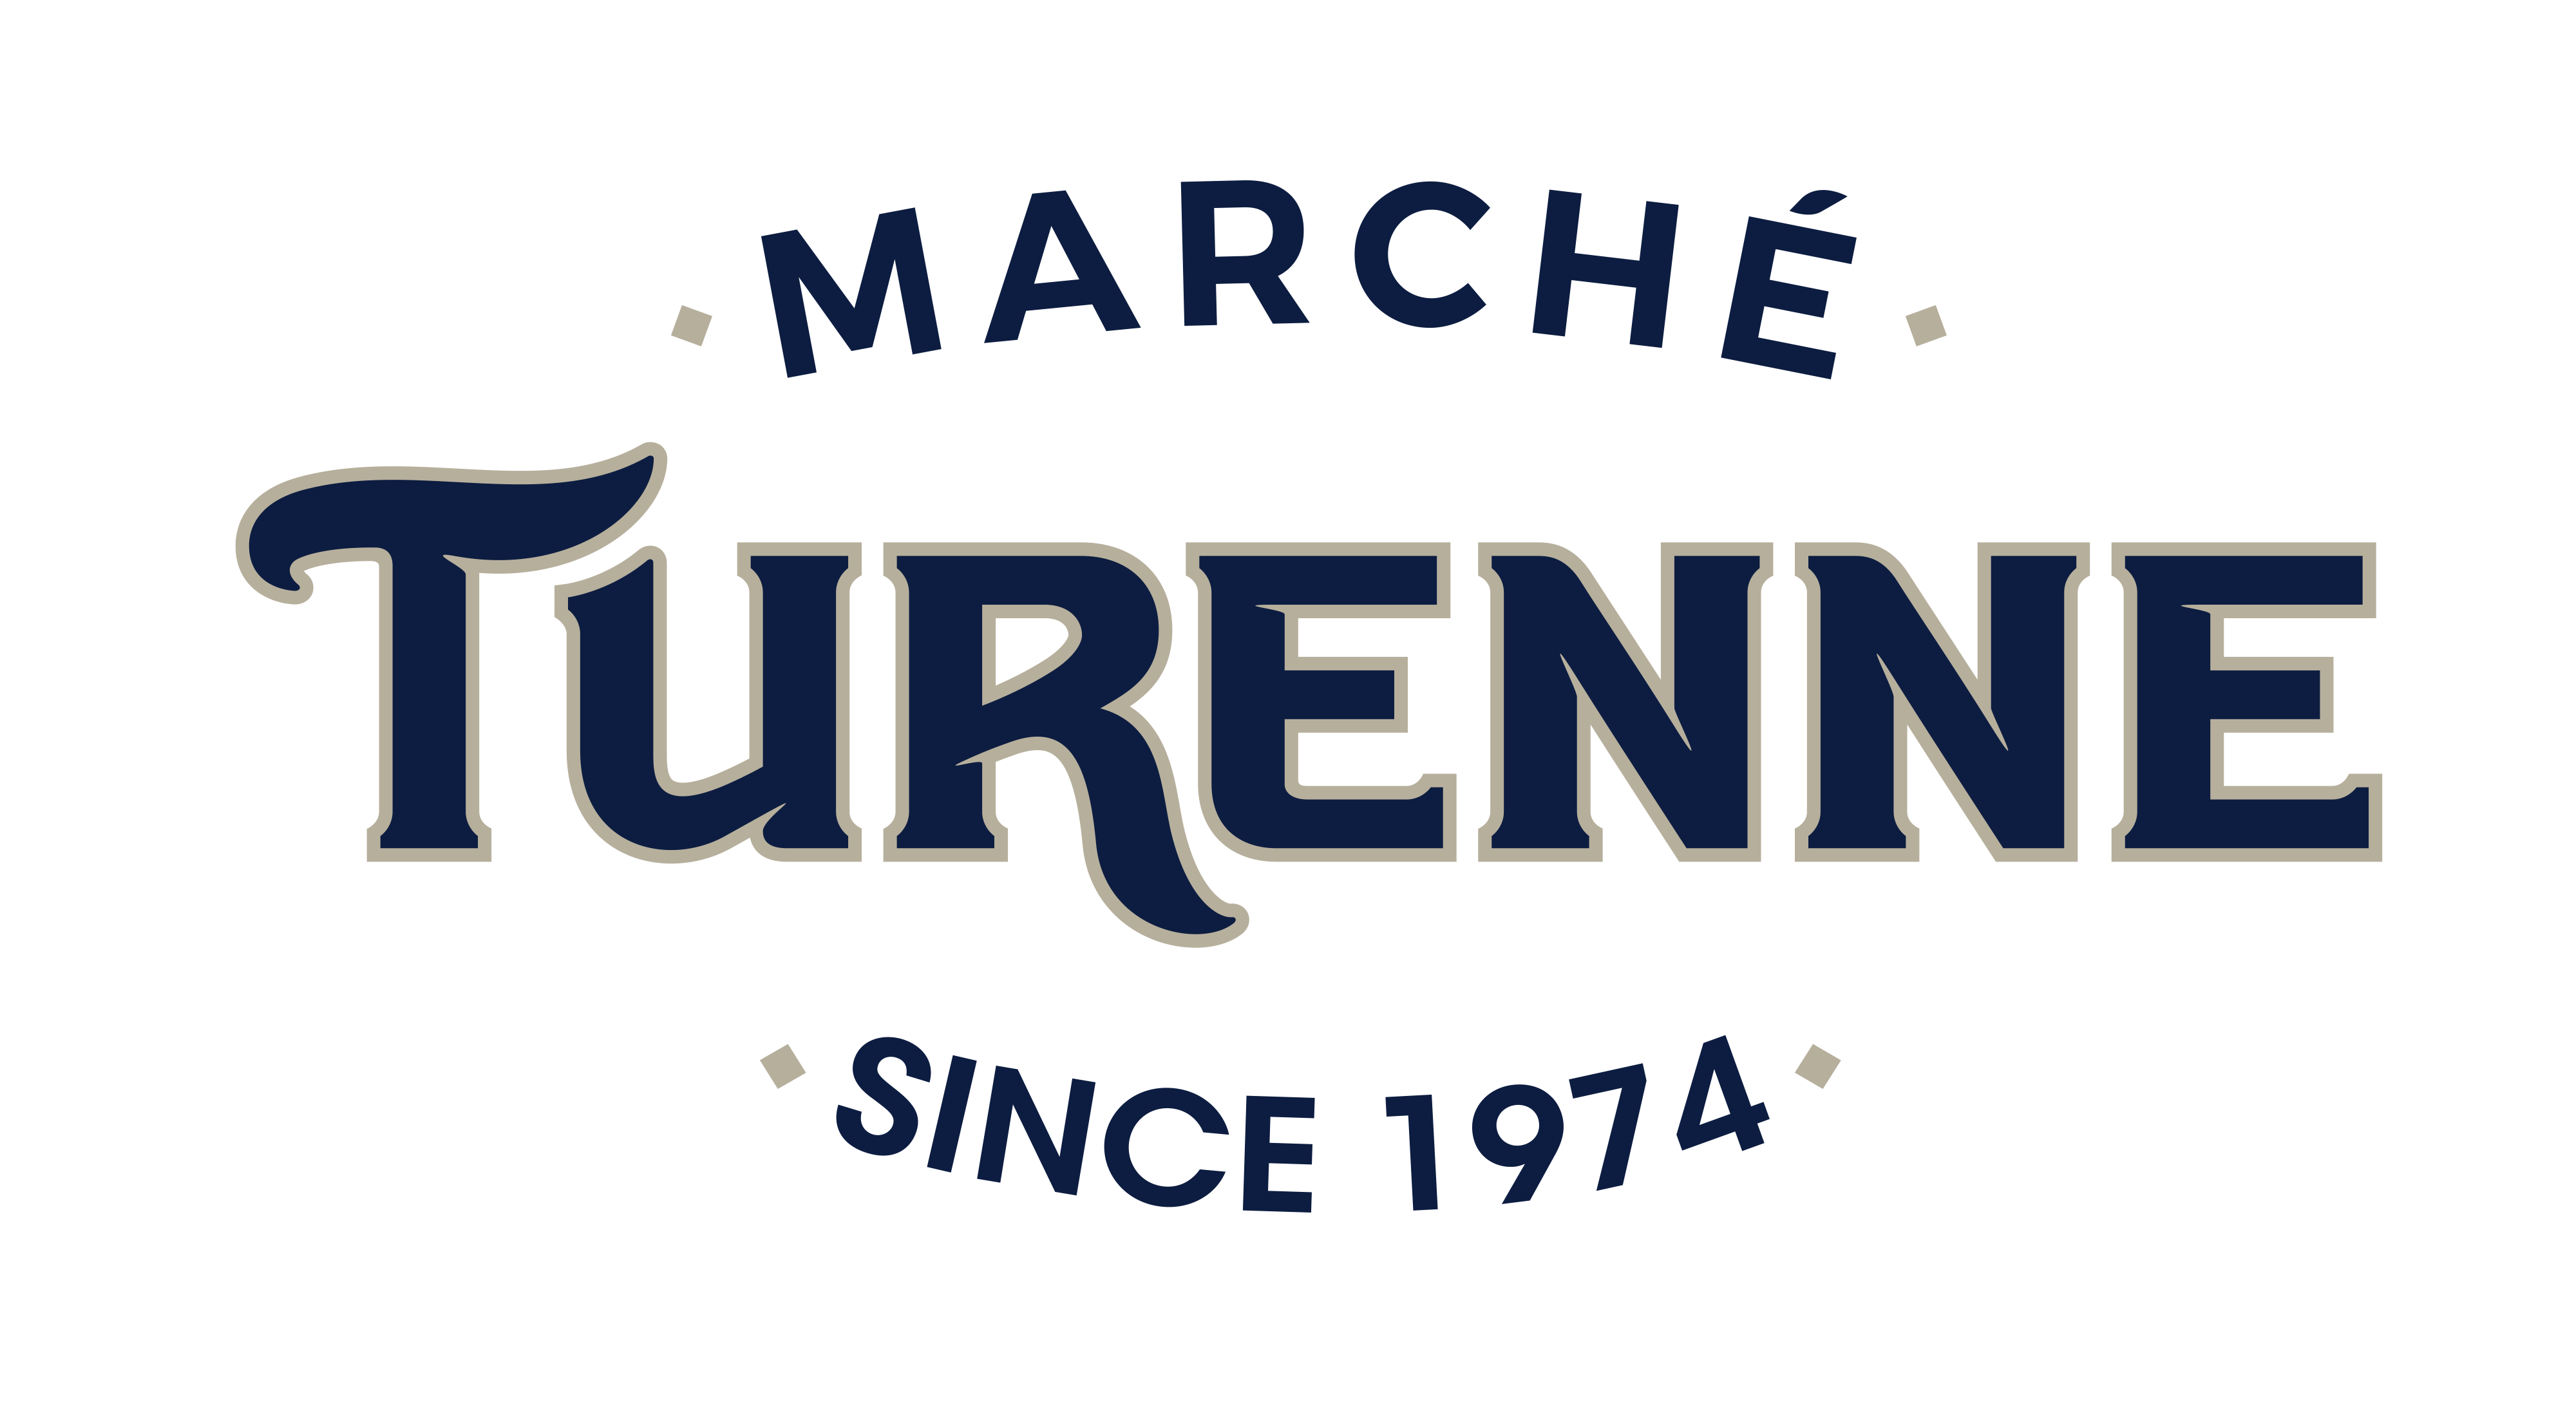 Marché Turenne